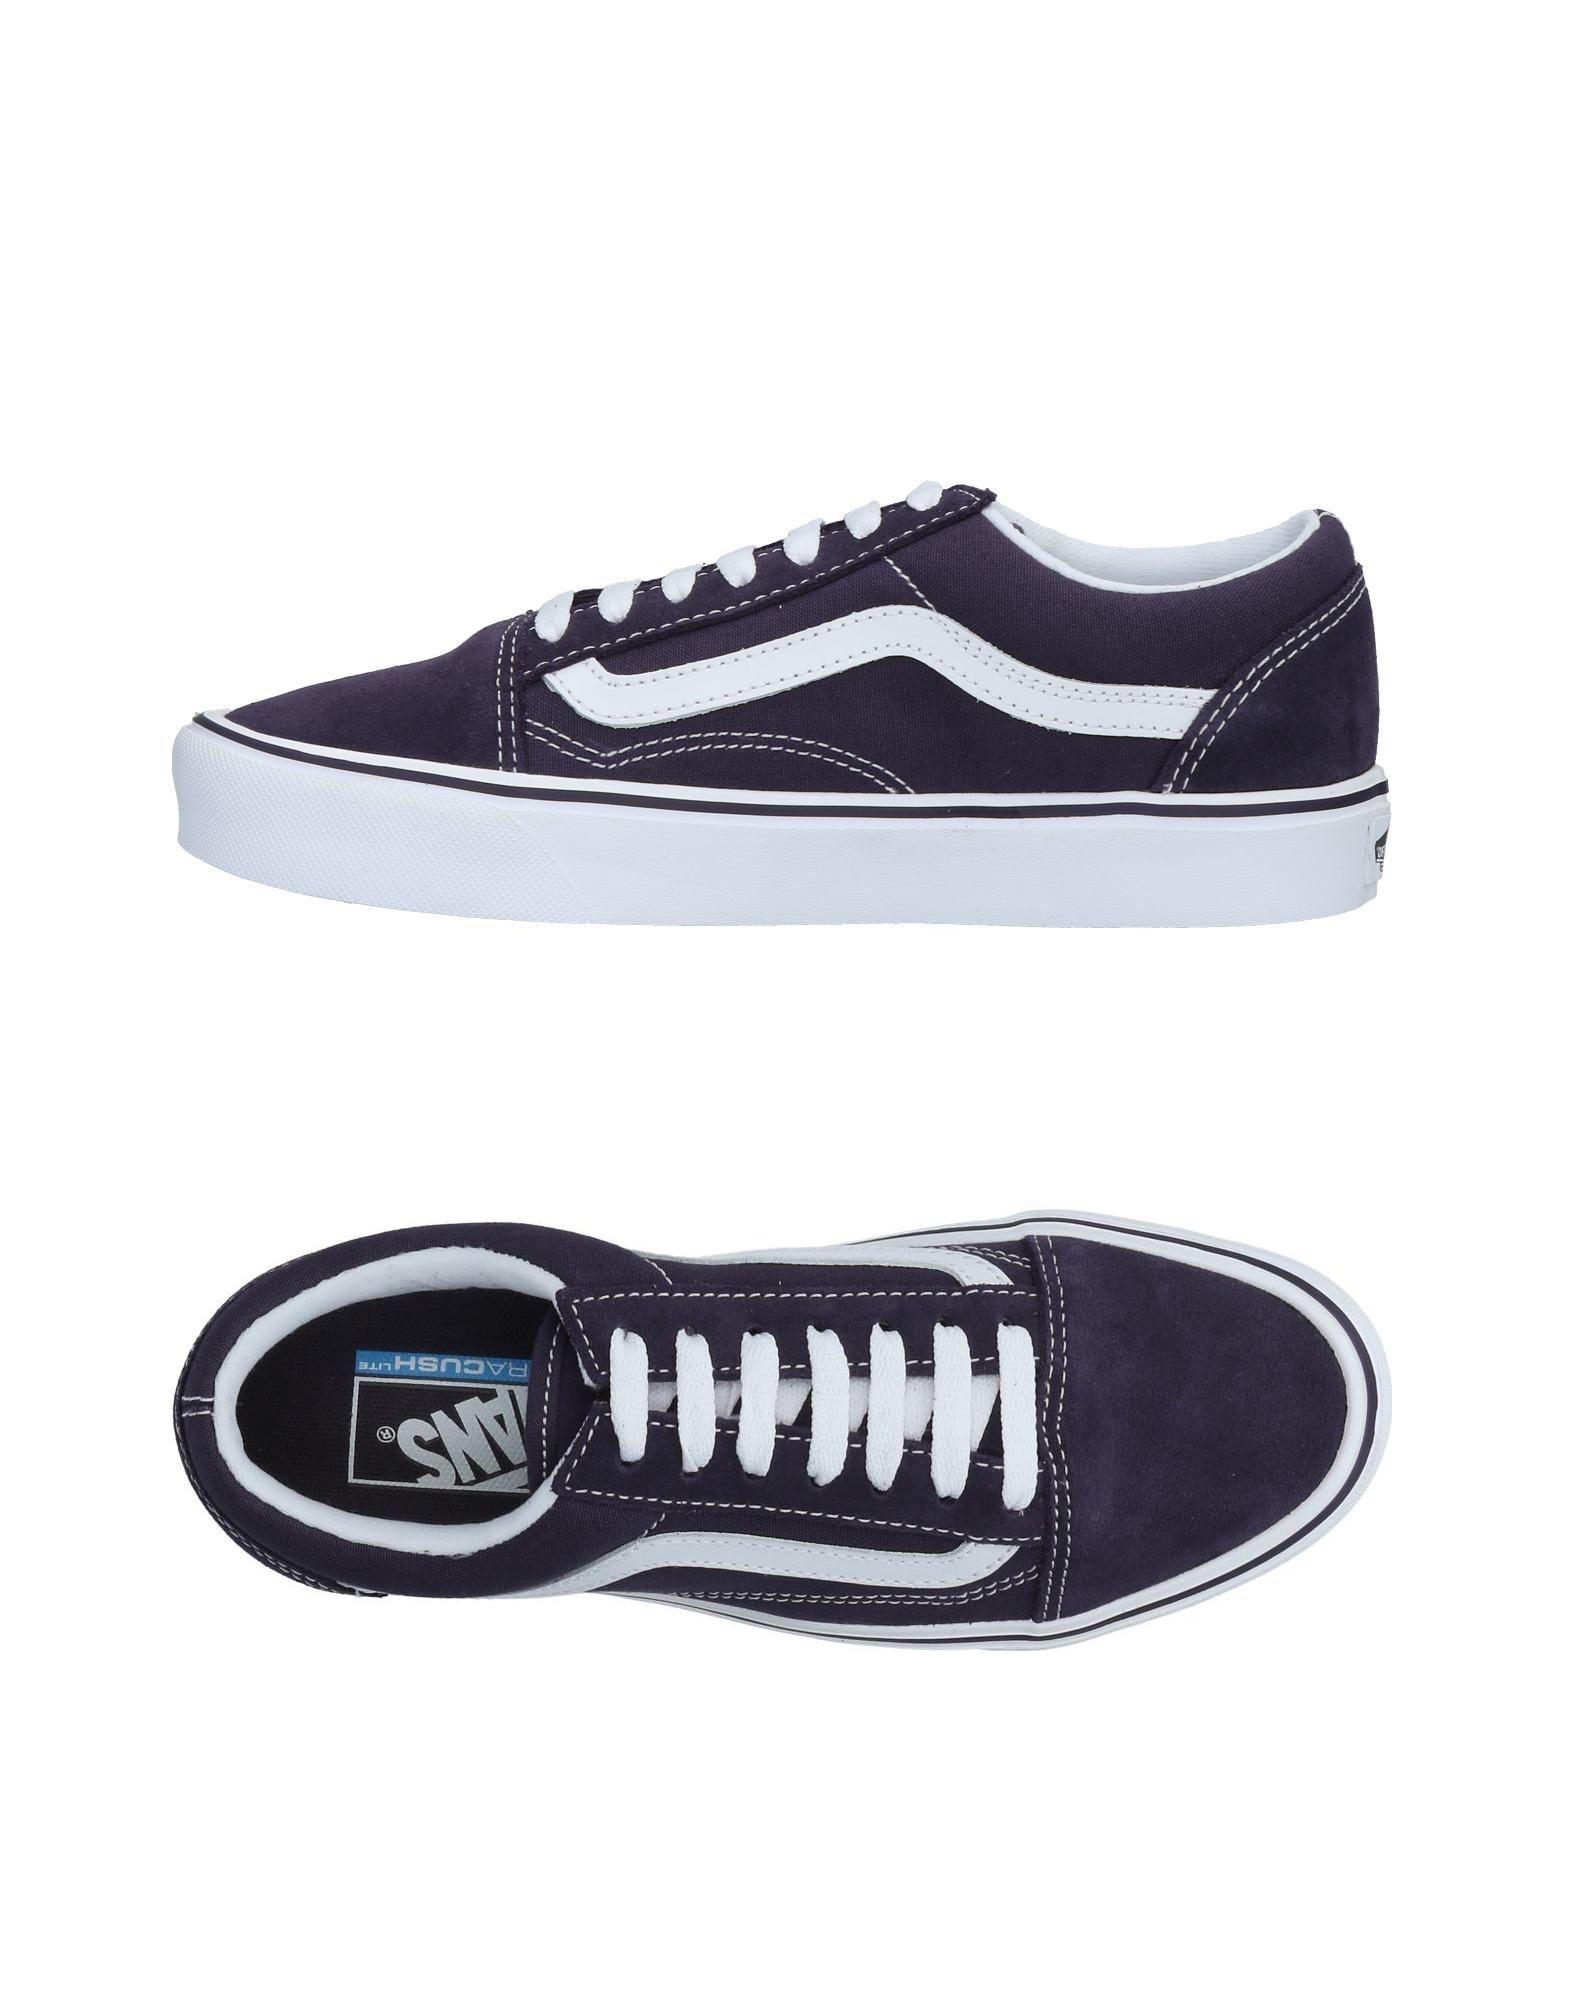 Sneakers Vans Donna - 11476188UI 11476188UI 11476188UI c6d28b